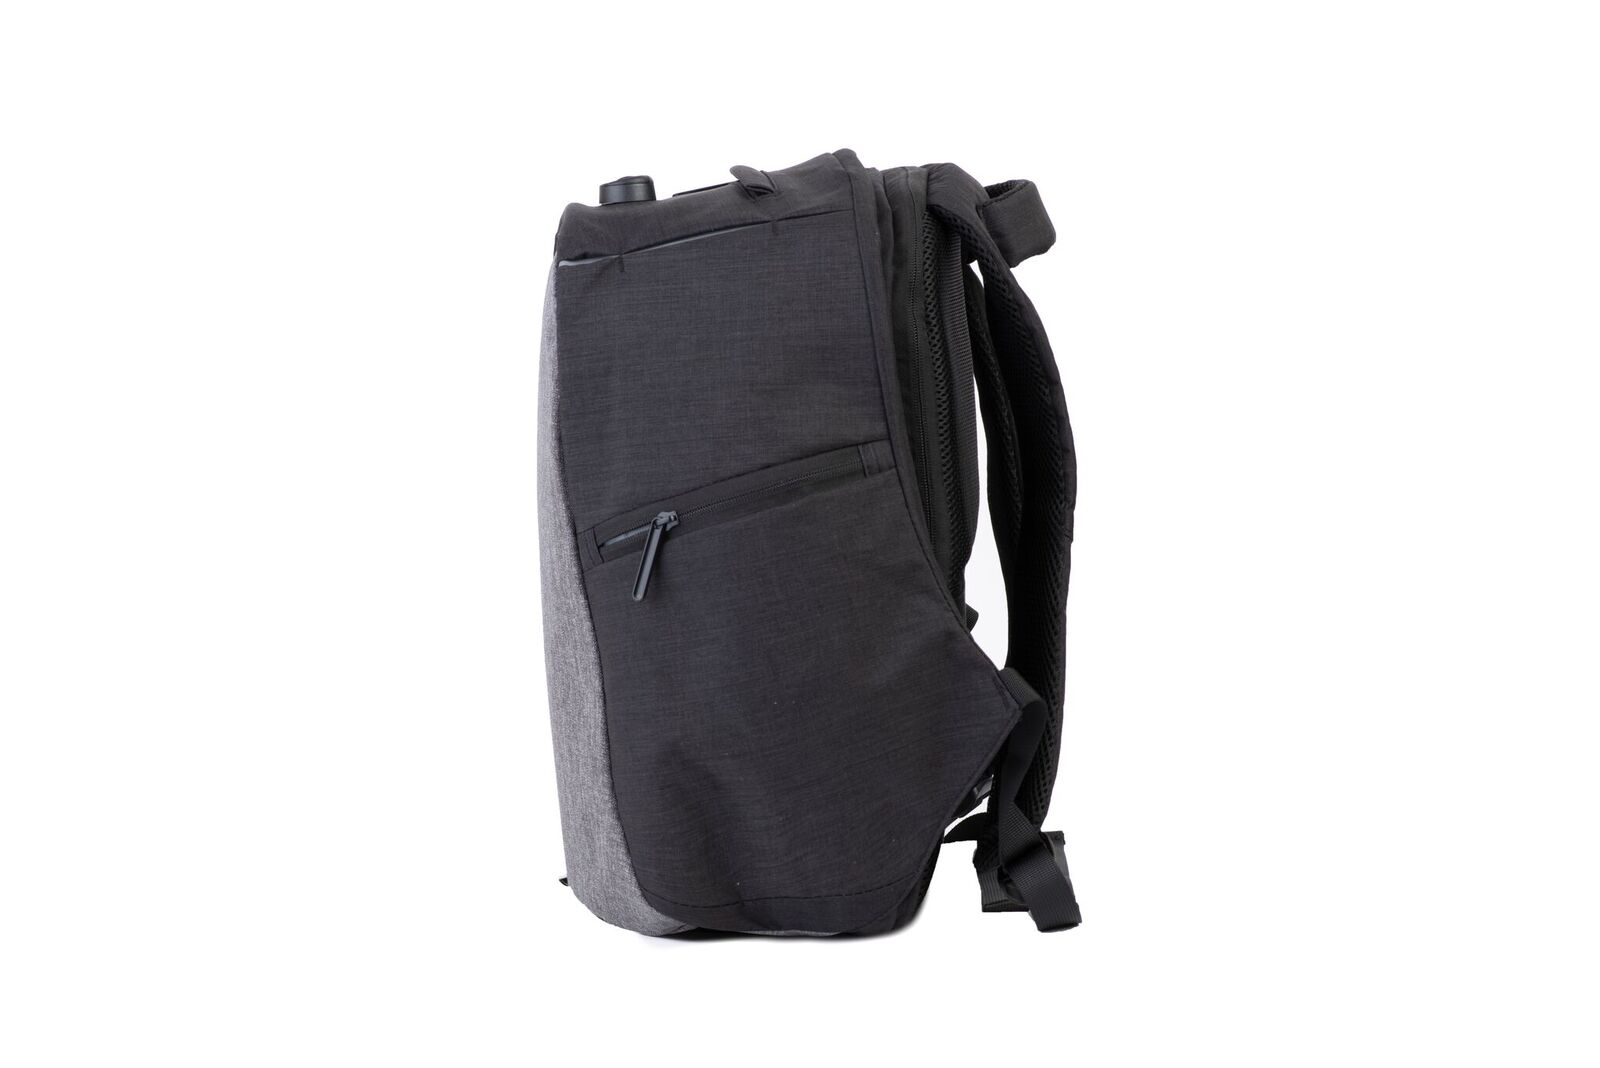 side view of snug backpack